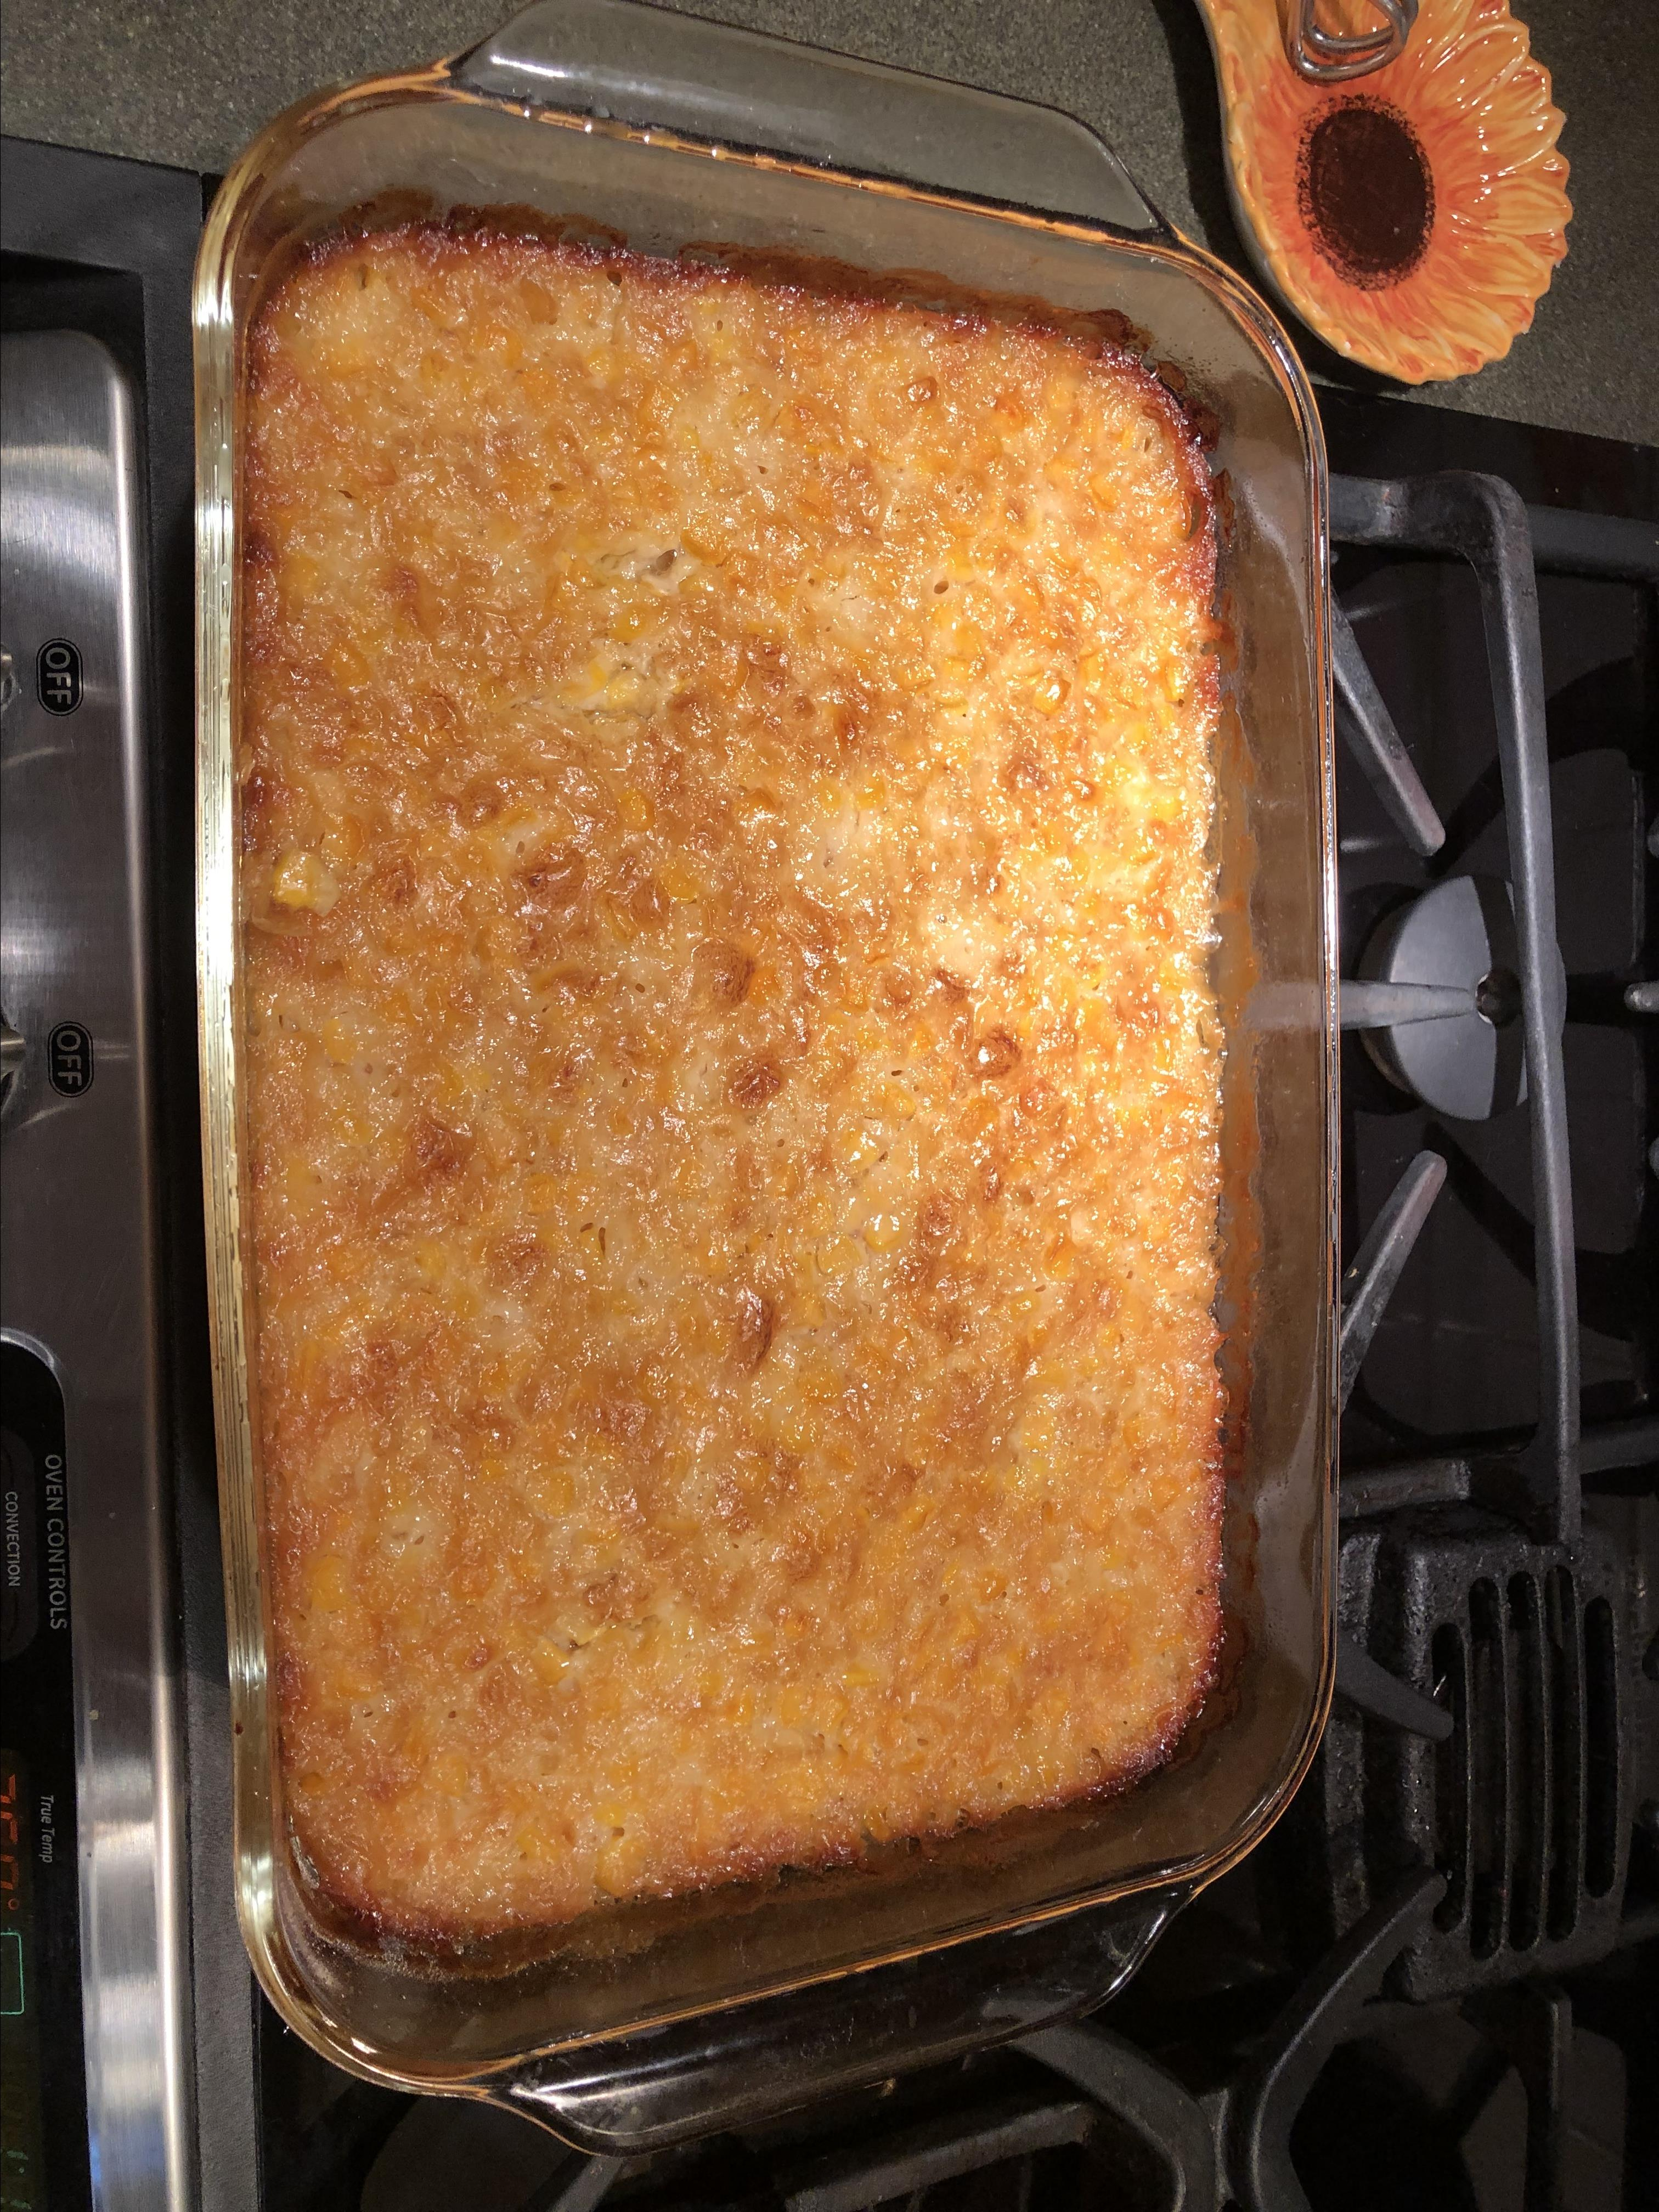 Kathy's Southern Corn Pudding